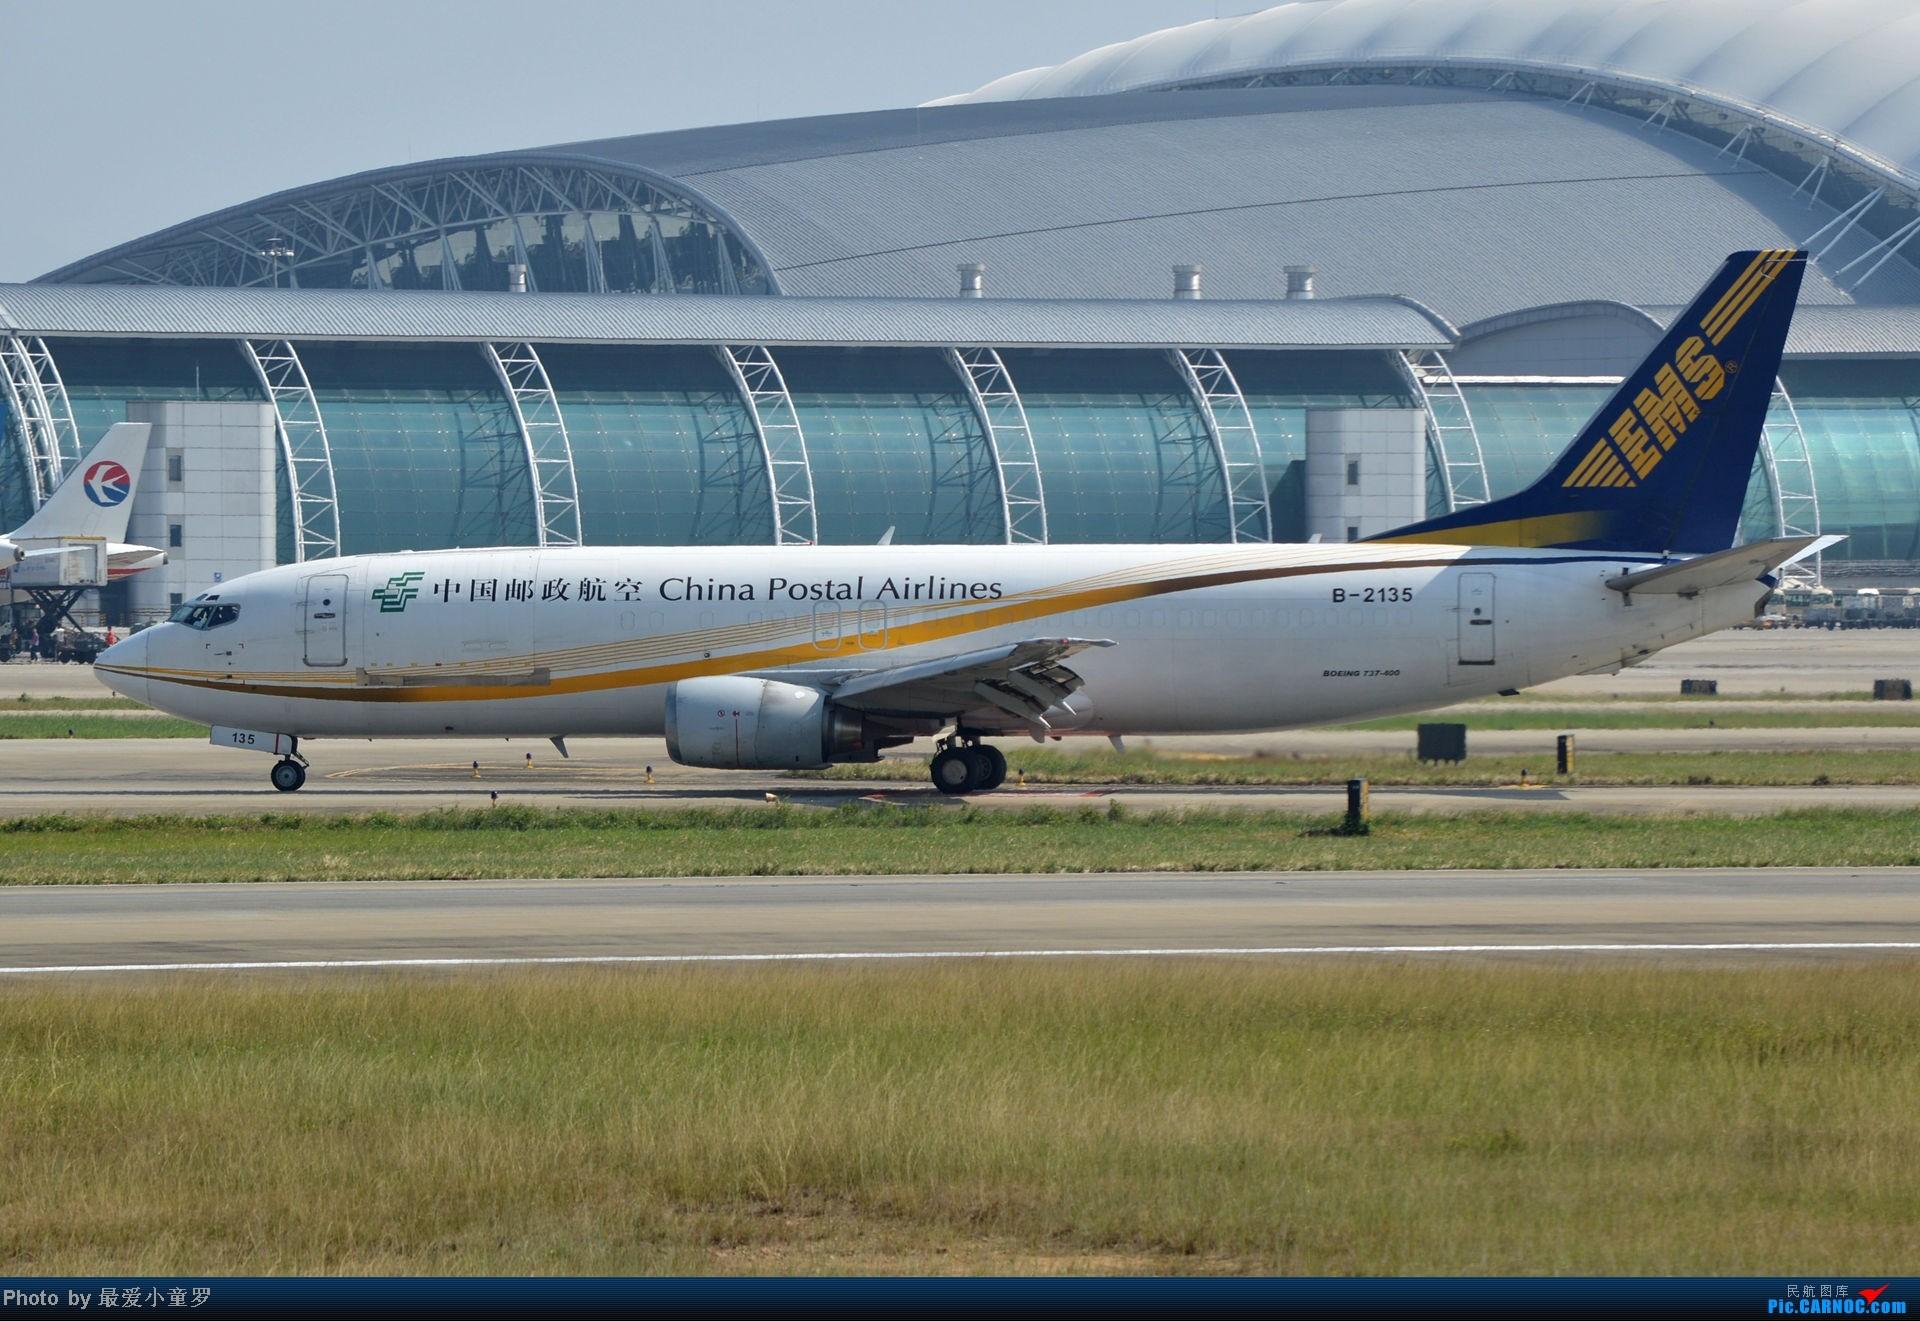 Re:[原创]老图系列,13年11月15日广州白云机场西跑拍机 BOEING 737-400 B-2135 中国广州白云机场